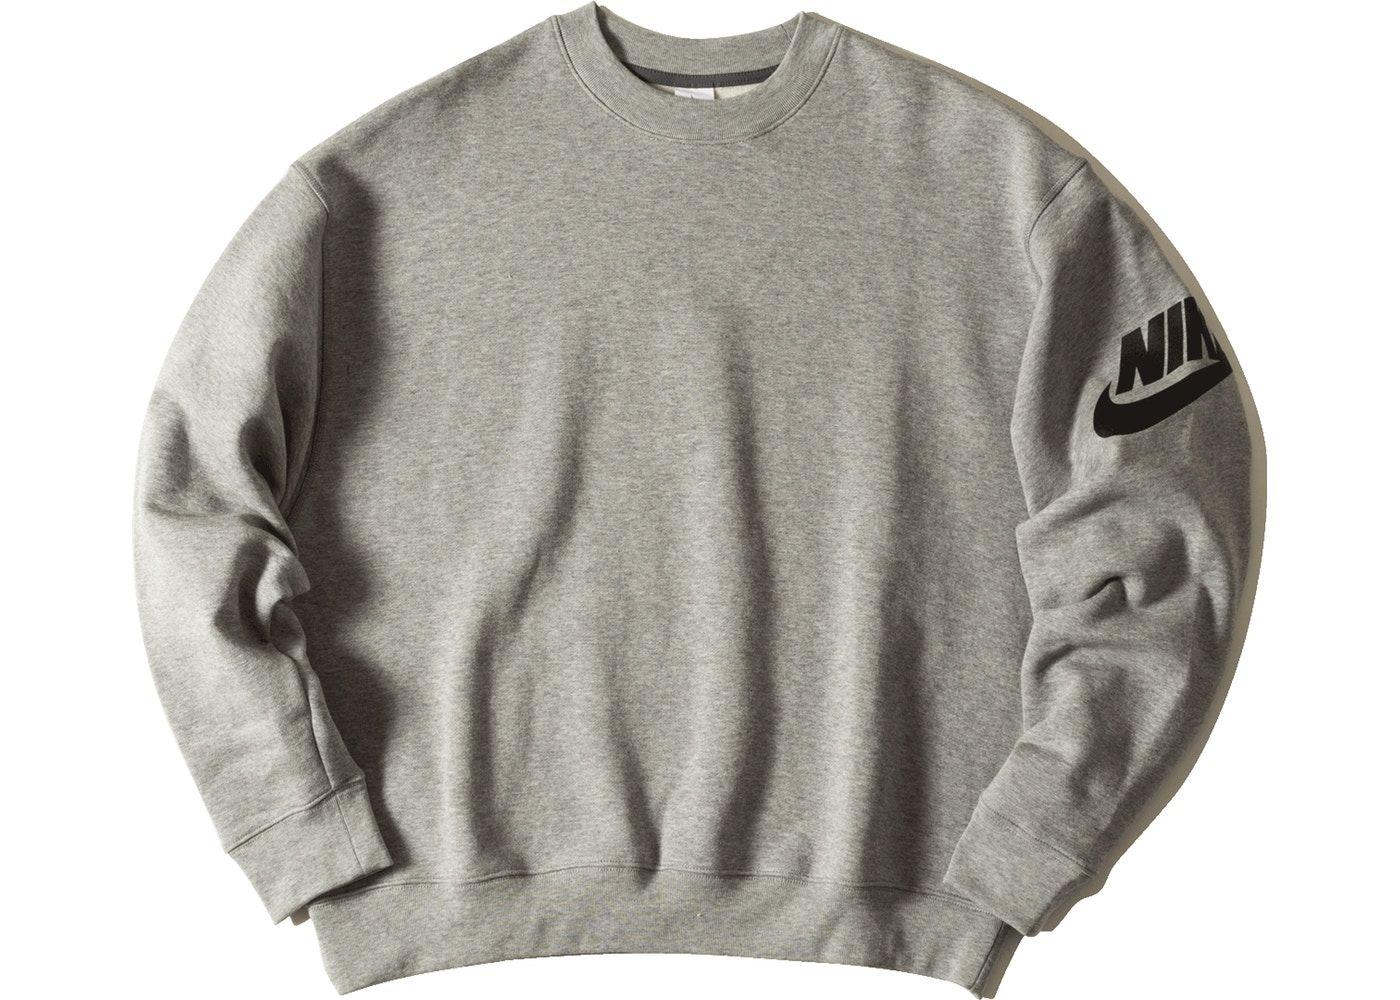 Fear Of God X Nike Nrg Ti Crewneck Dark Grey Heather Balenciaga Shirt Nike Sweatshirts Mens Outfits [ 1000 x 1400 Pixel ]